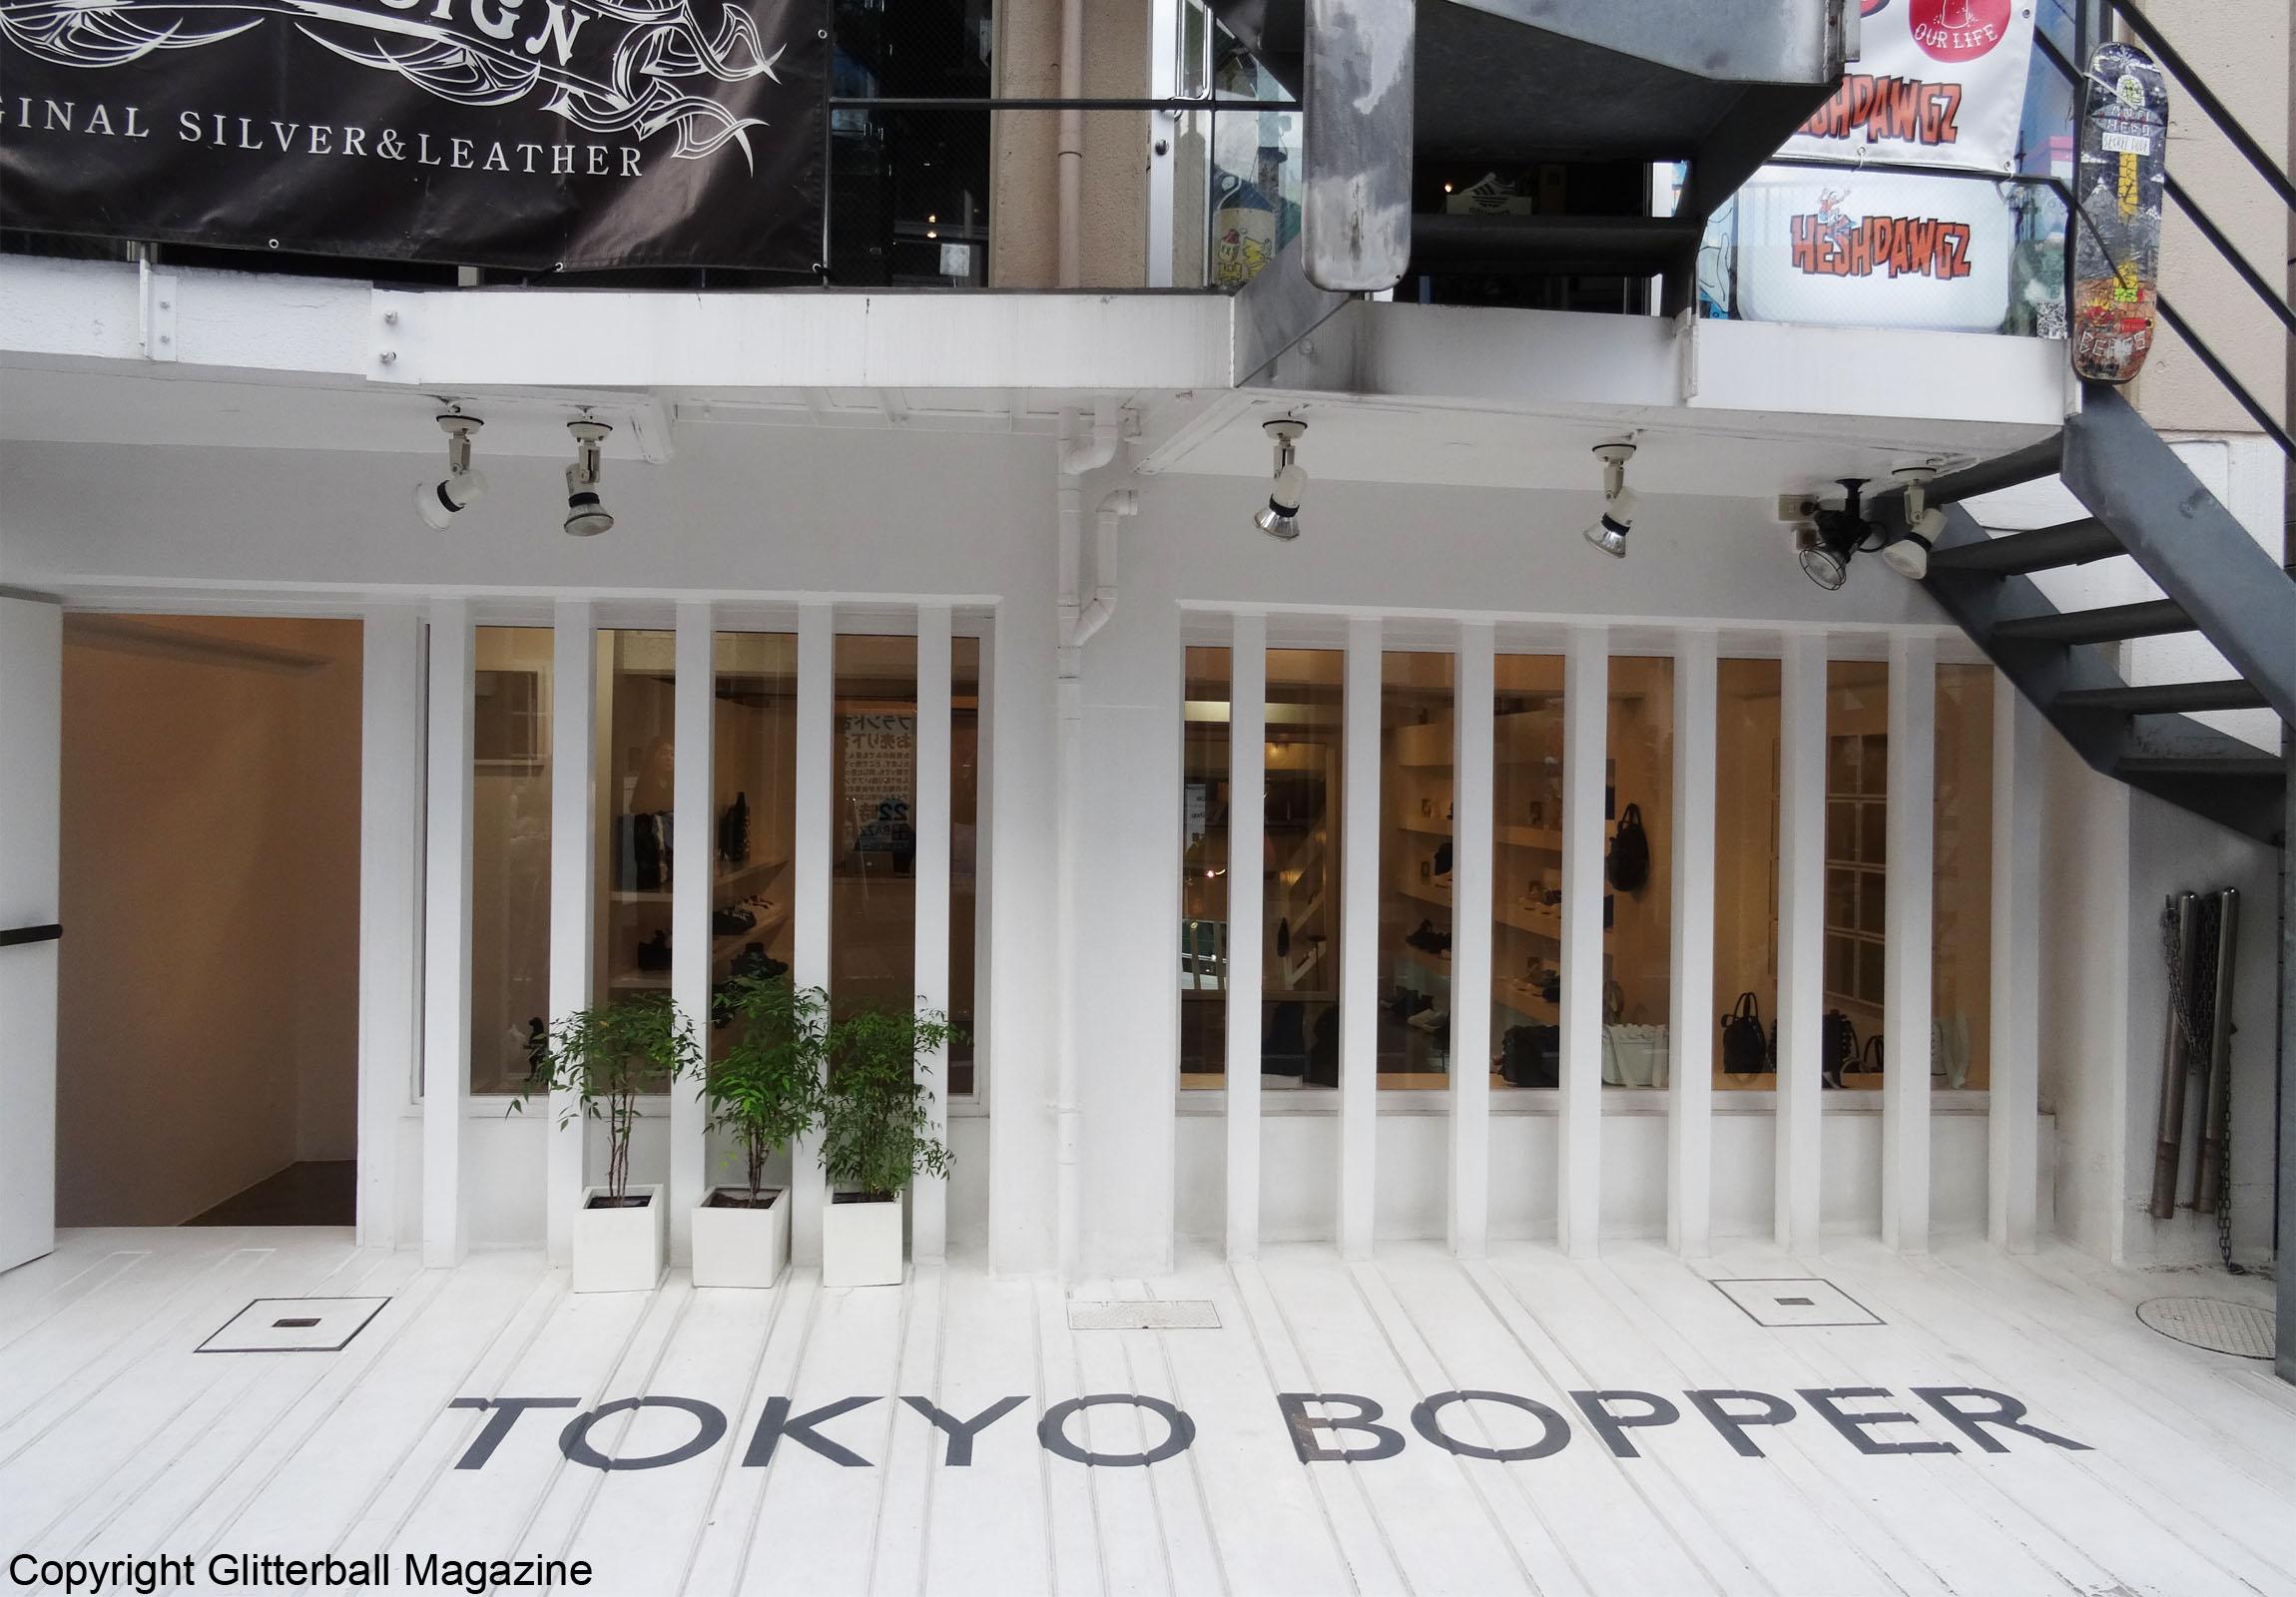 Tokyo Bopper shop, Cat Street